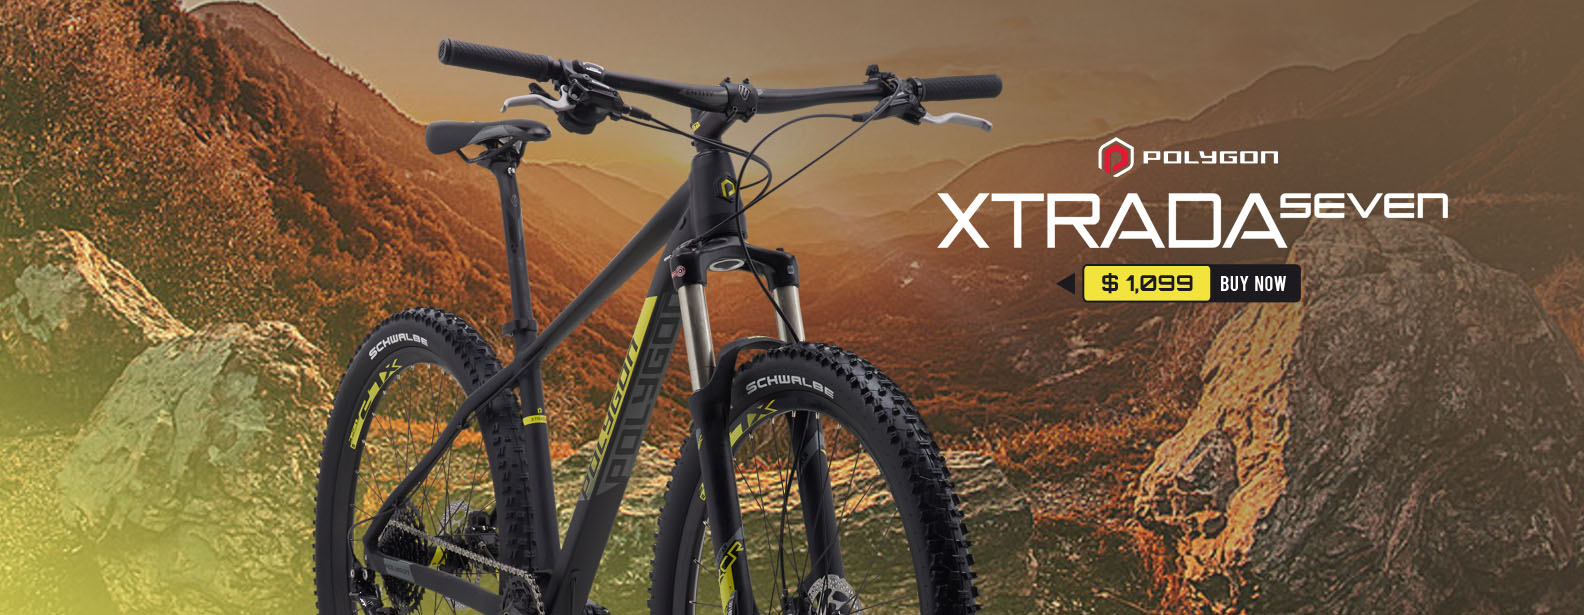 Polygon Xtrada 7 Mountain Bike